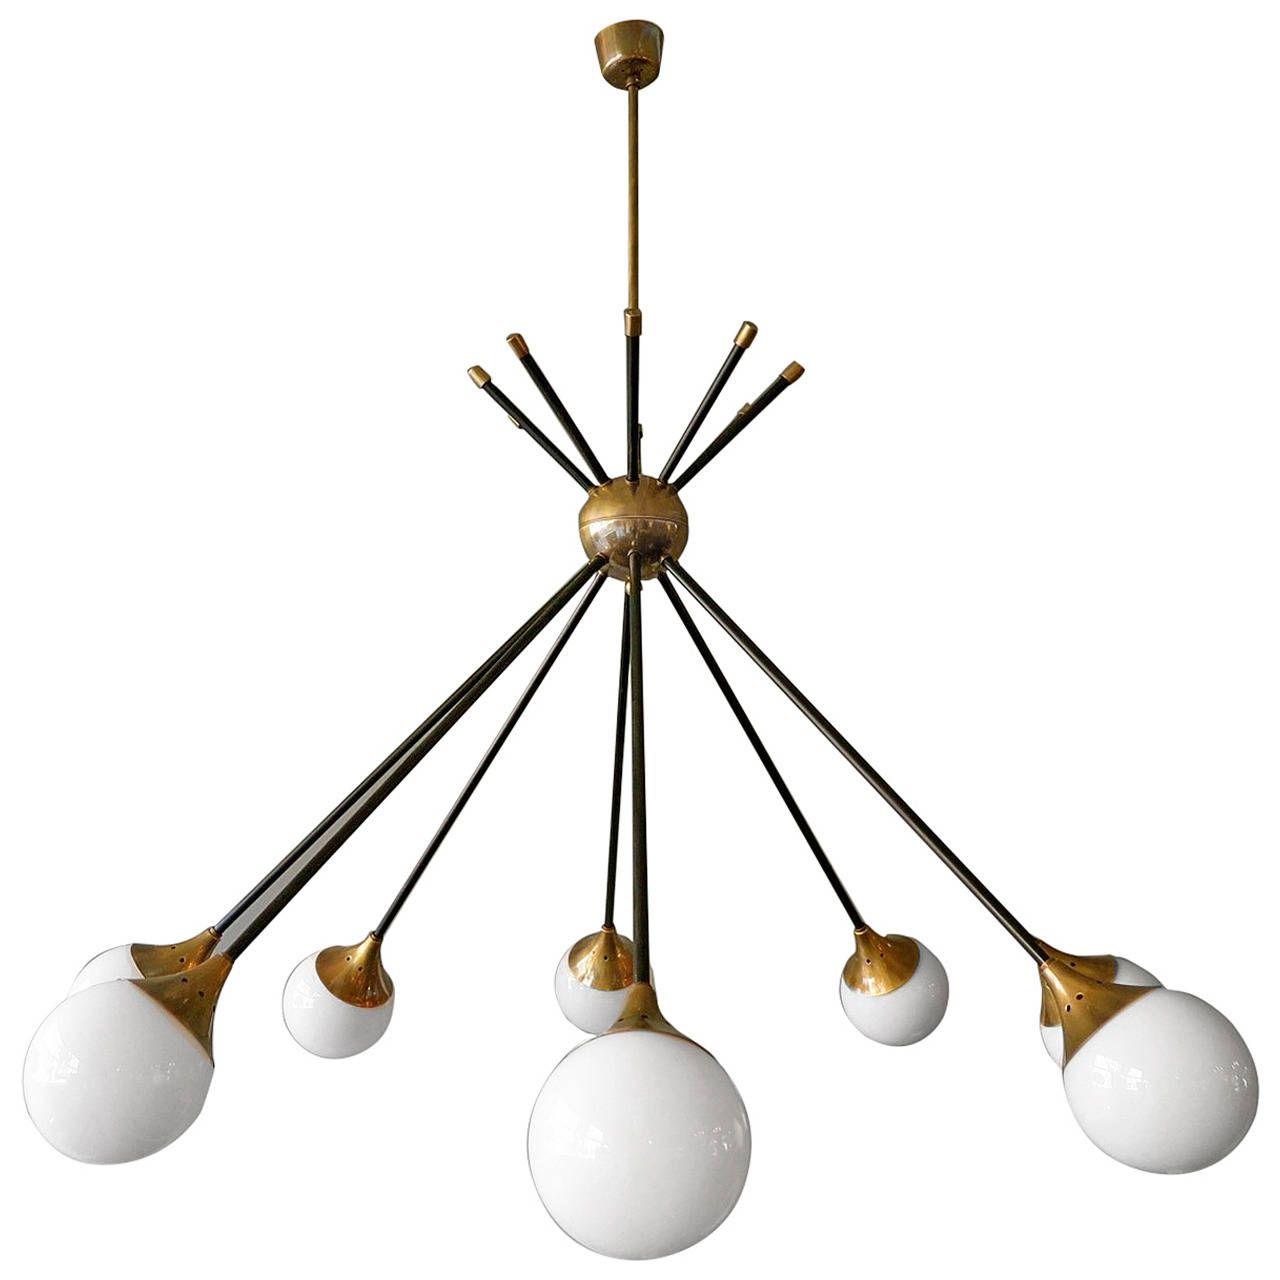 Italian Stilnovo Sputnik Chandelier